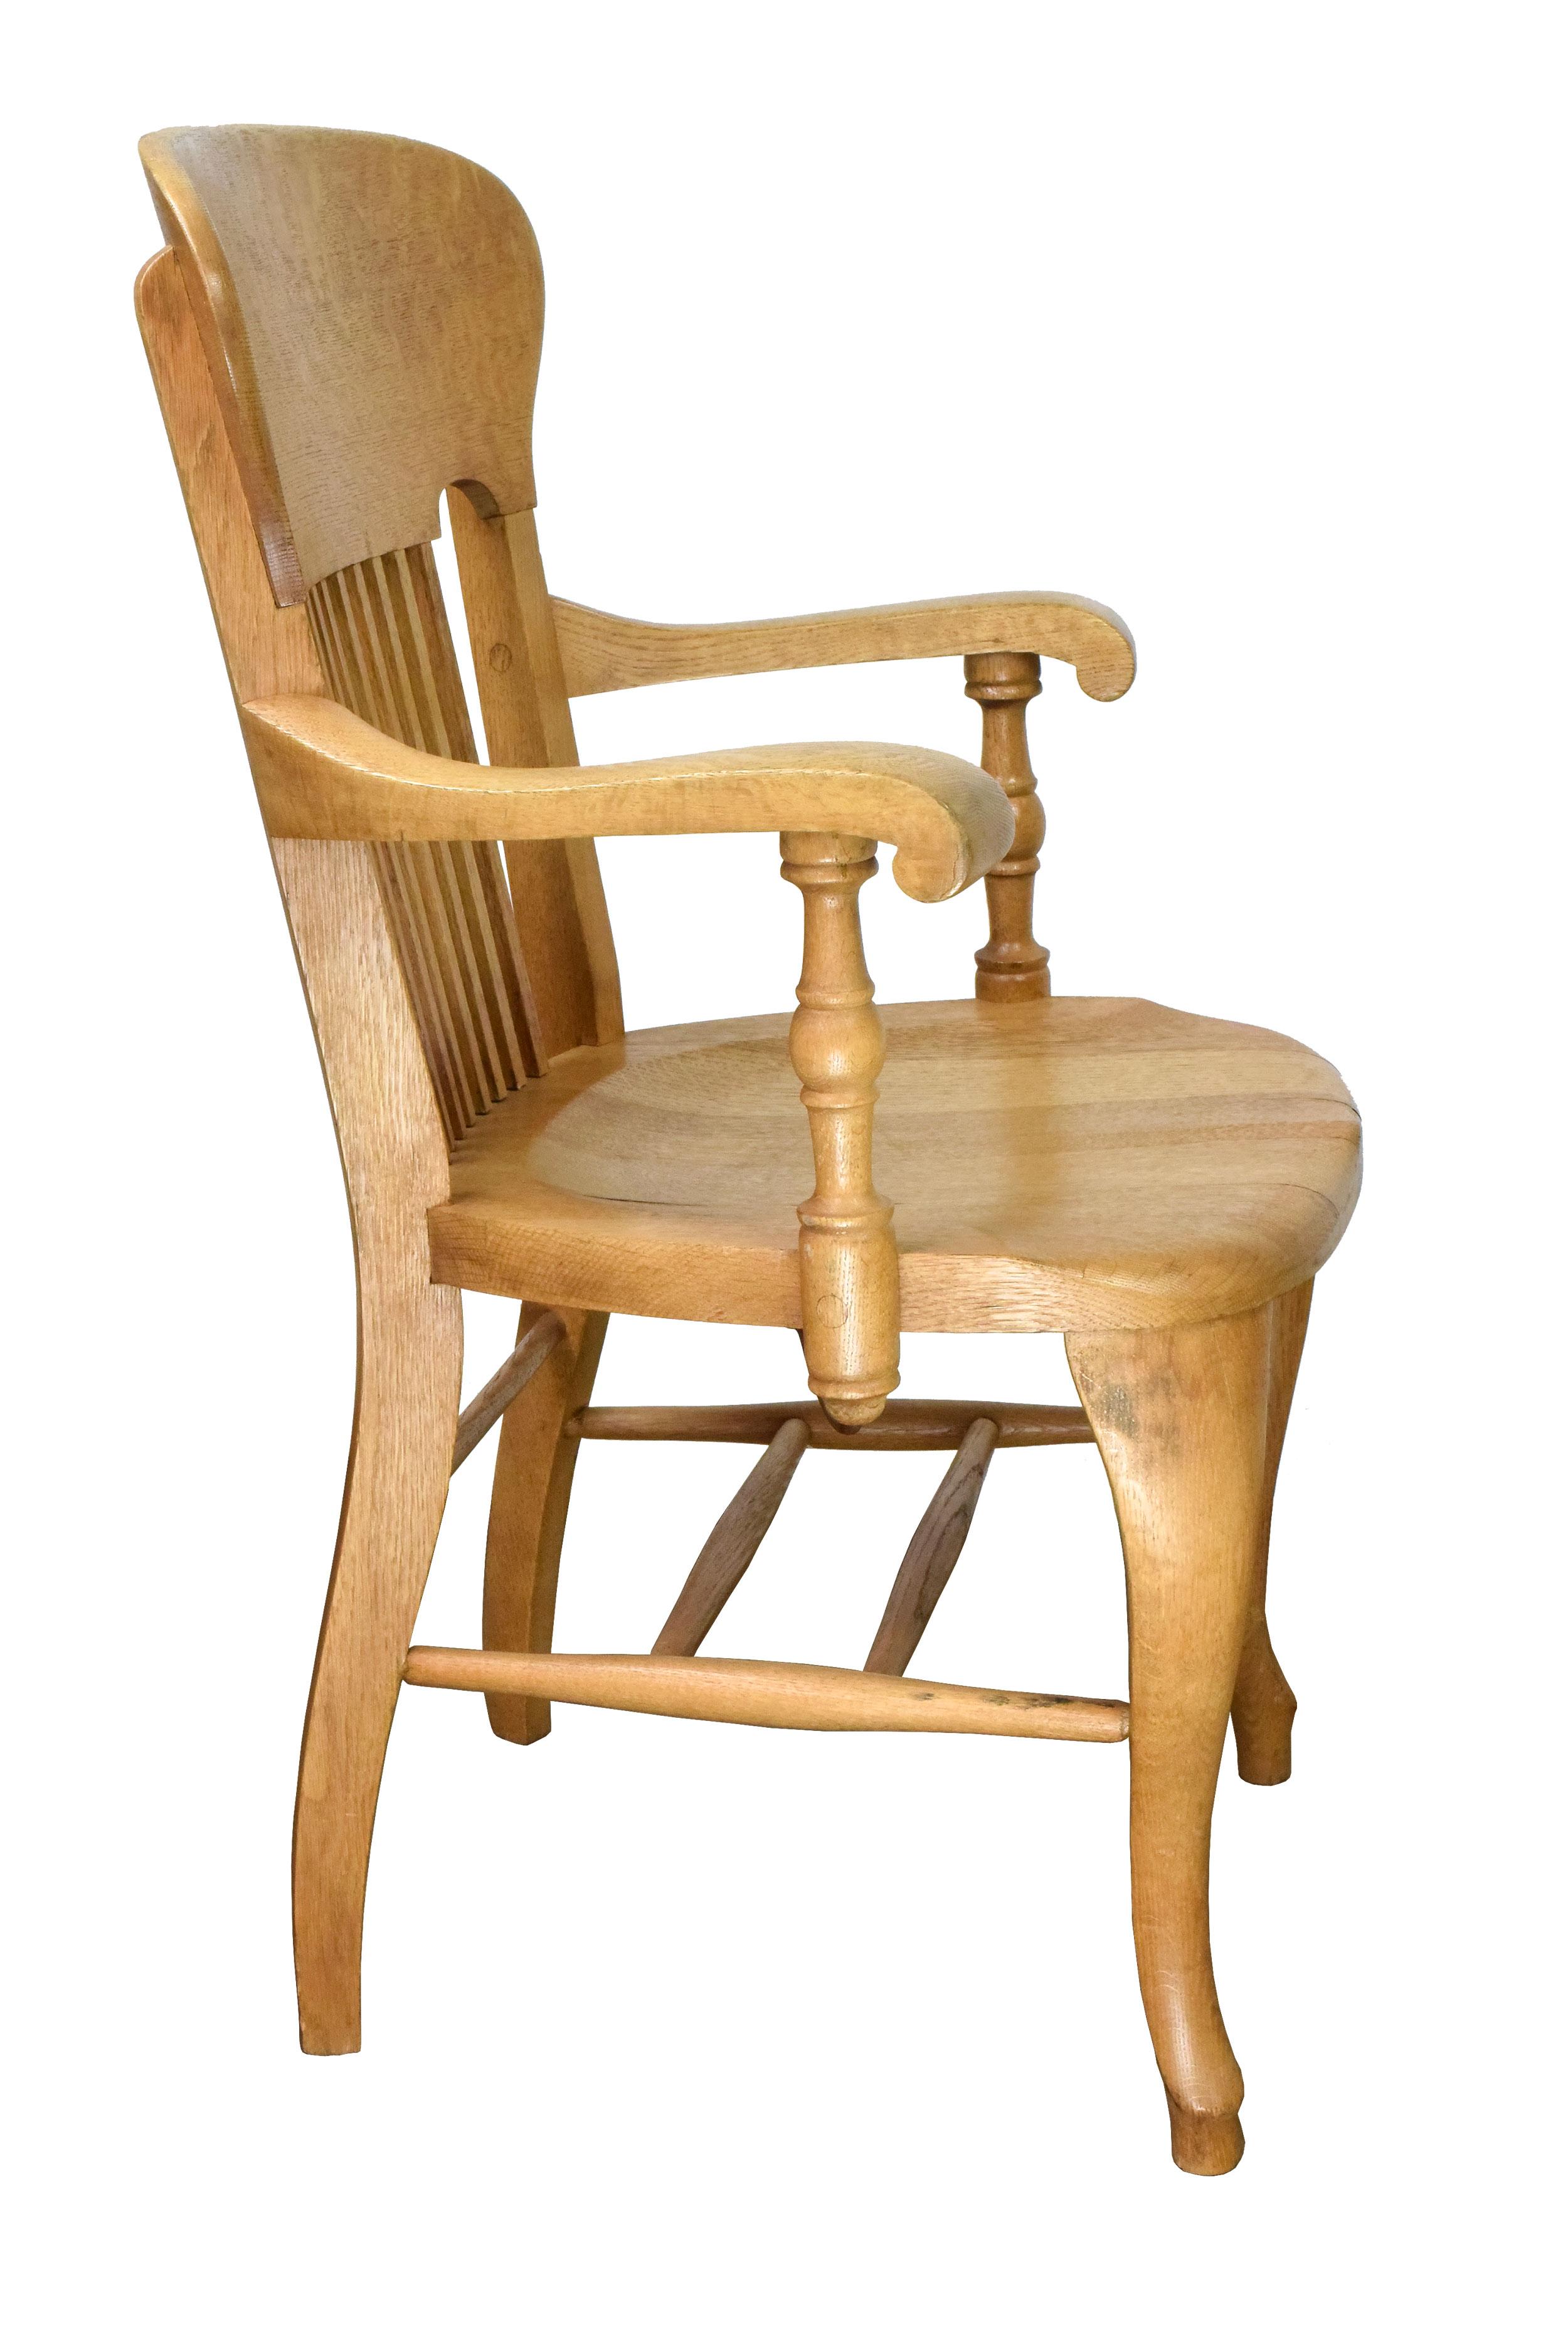 47057-quartersawn-oak-courtroom-chair-side-view.jpg